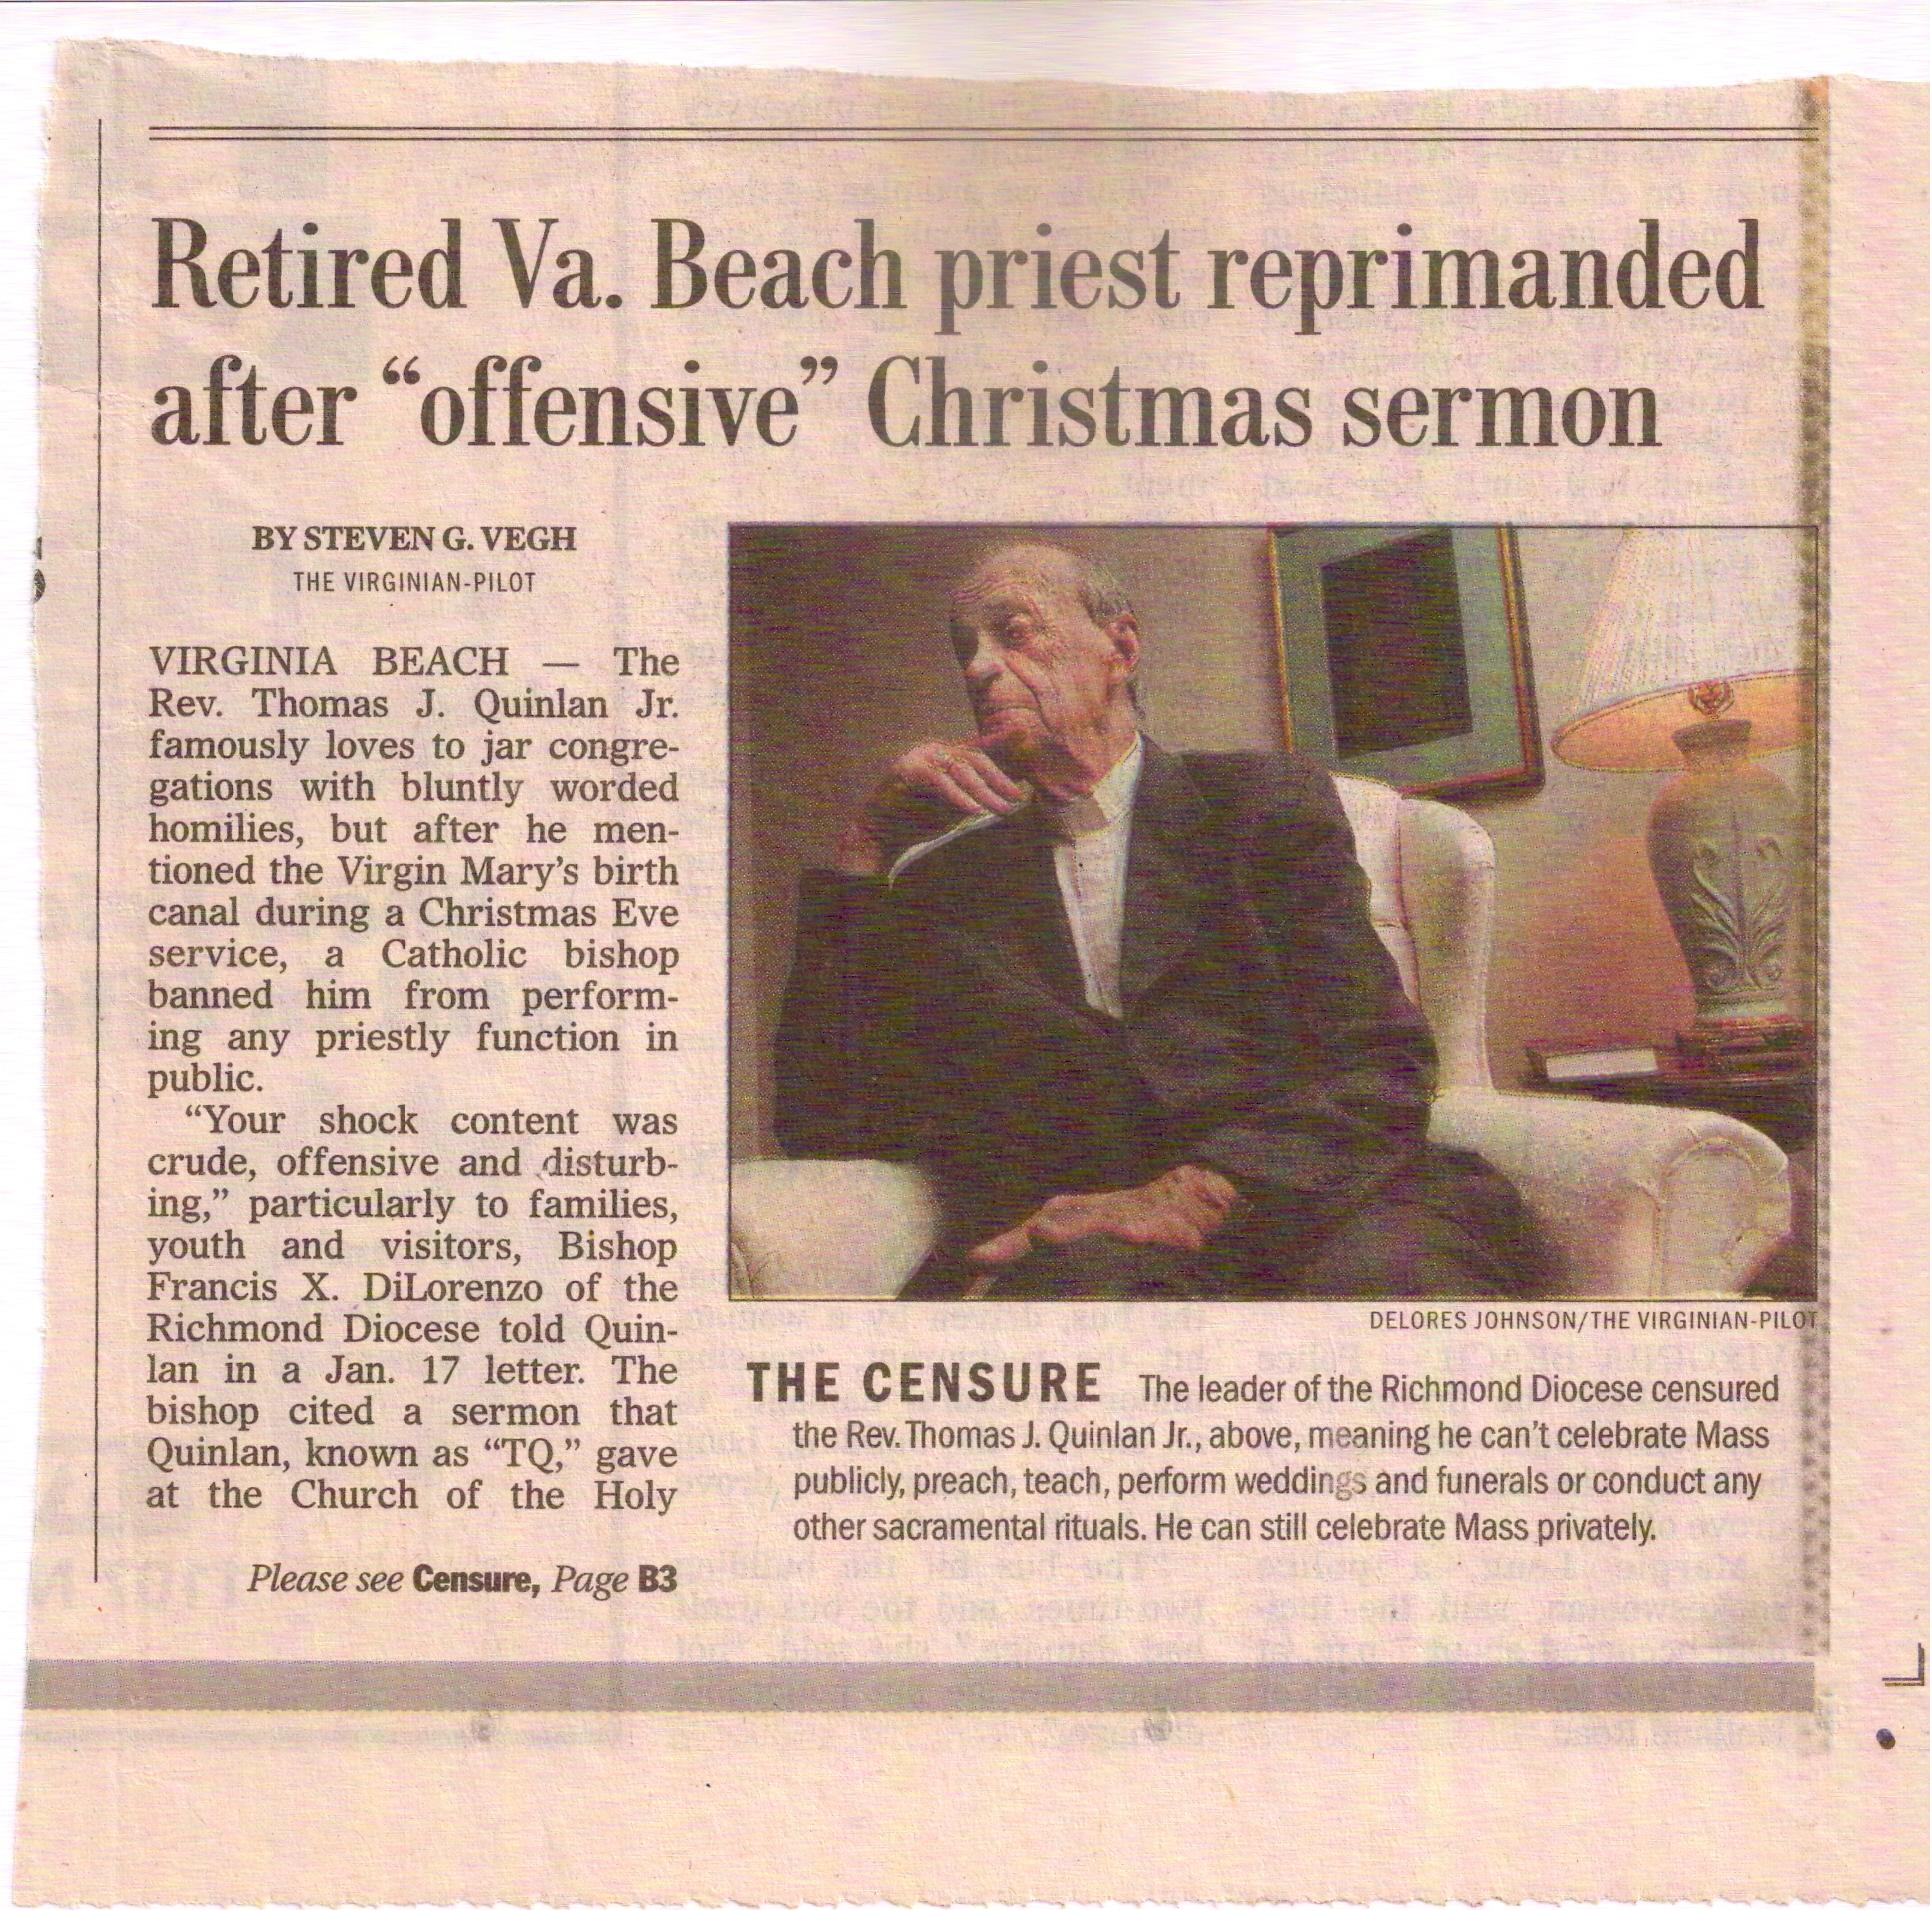 Virginian-Pilot article on TQ's reprimand